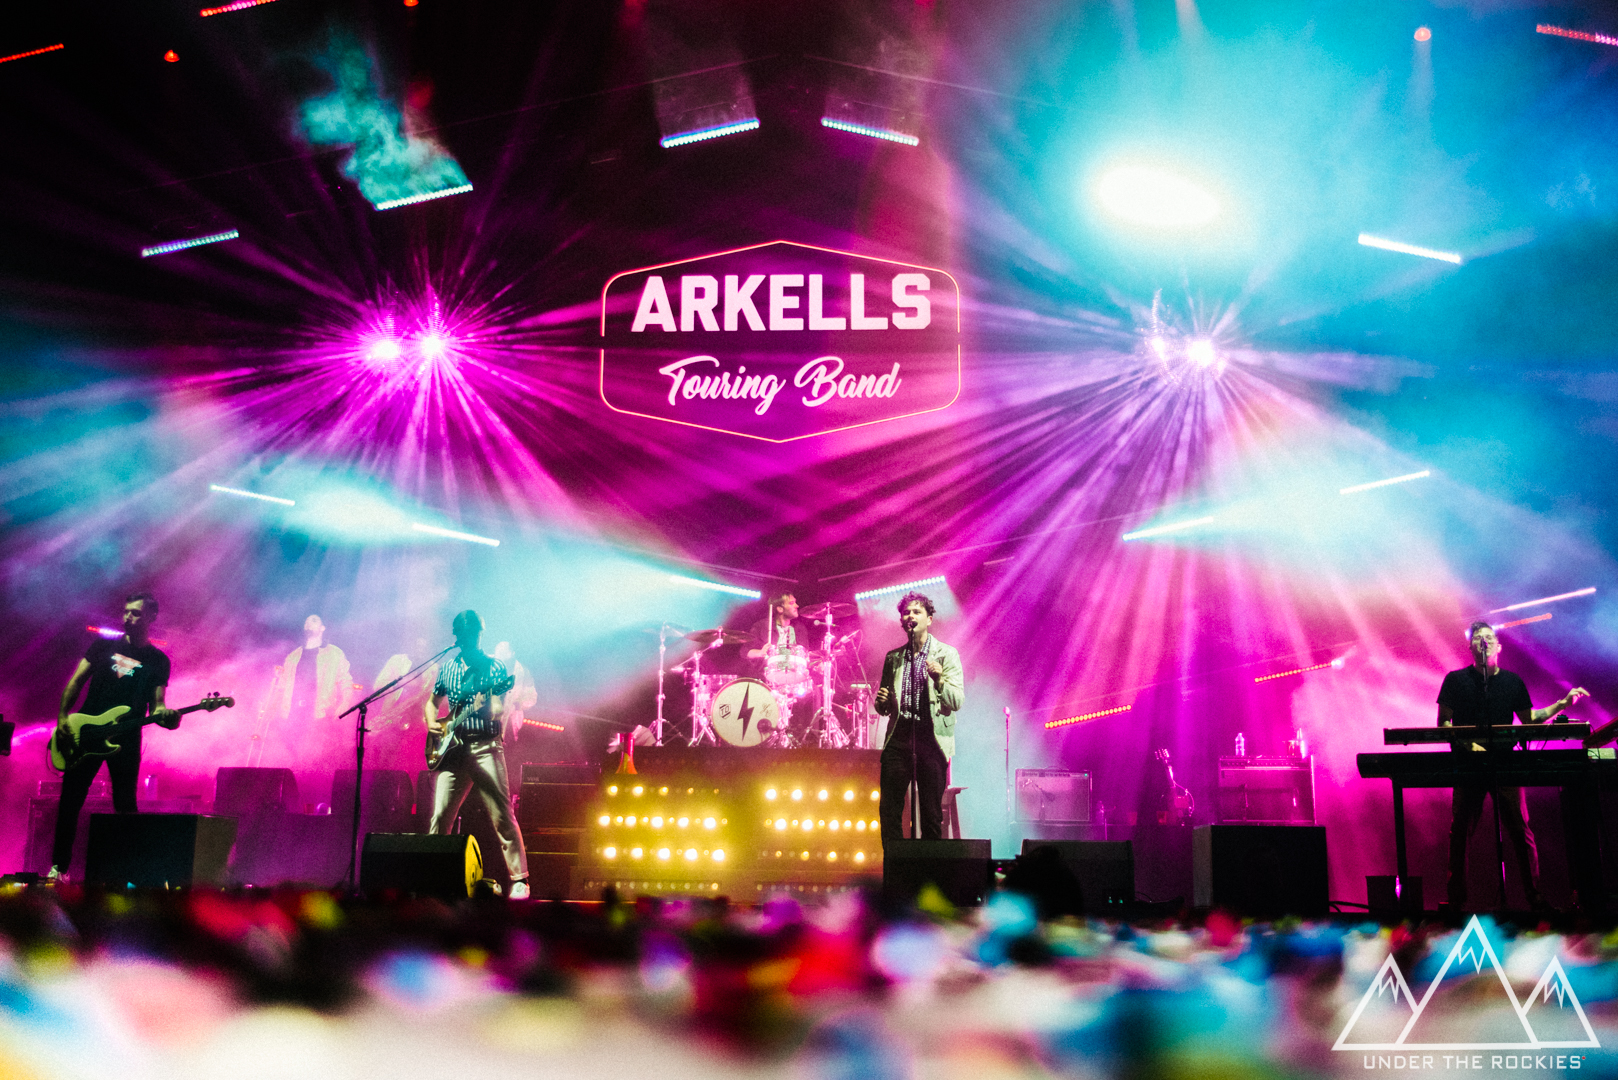 Arkells-36-JJP-20190209.jpg